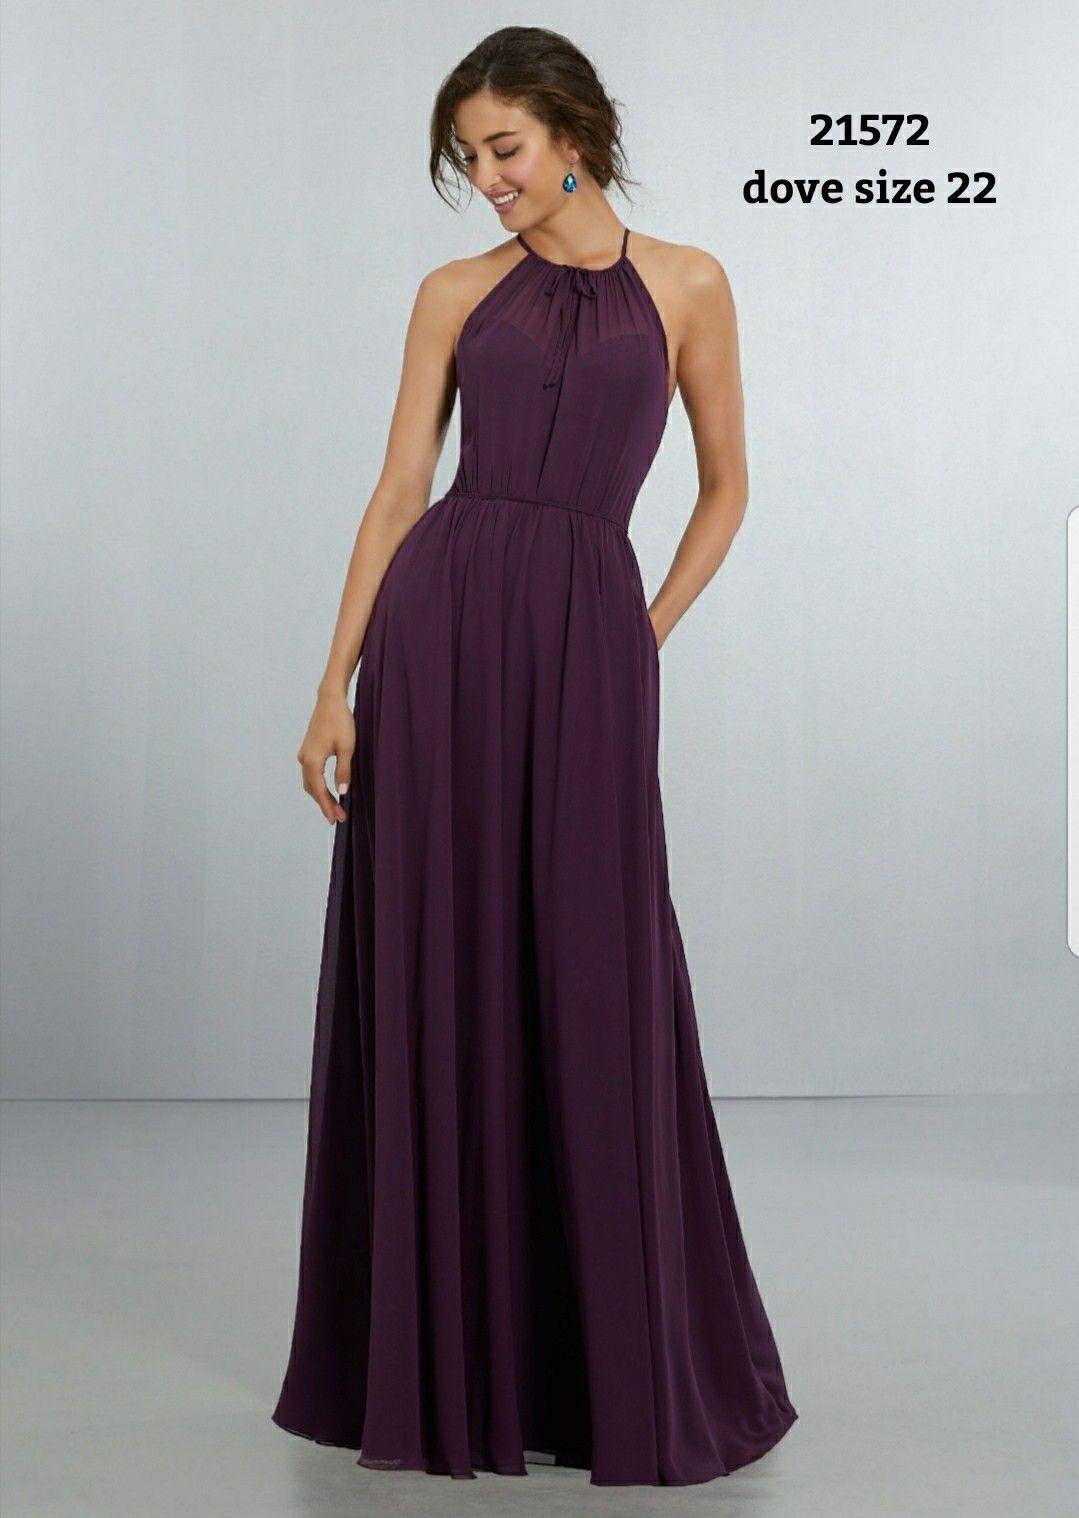 Best Bridesmaid Dress Style For Plus Size | Lixnet AG